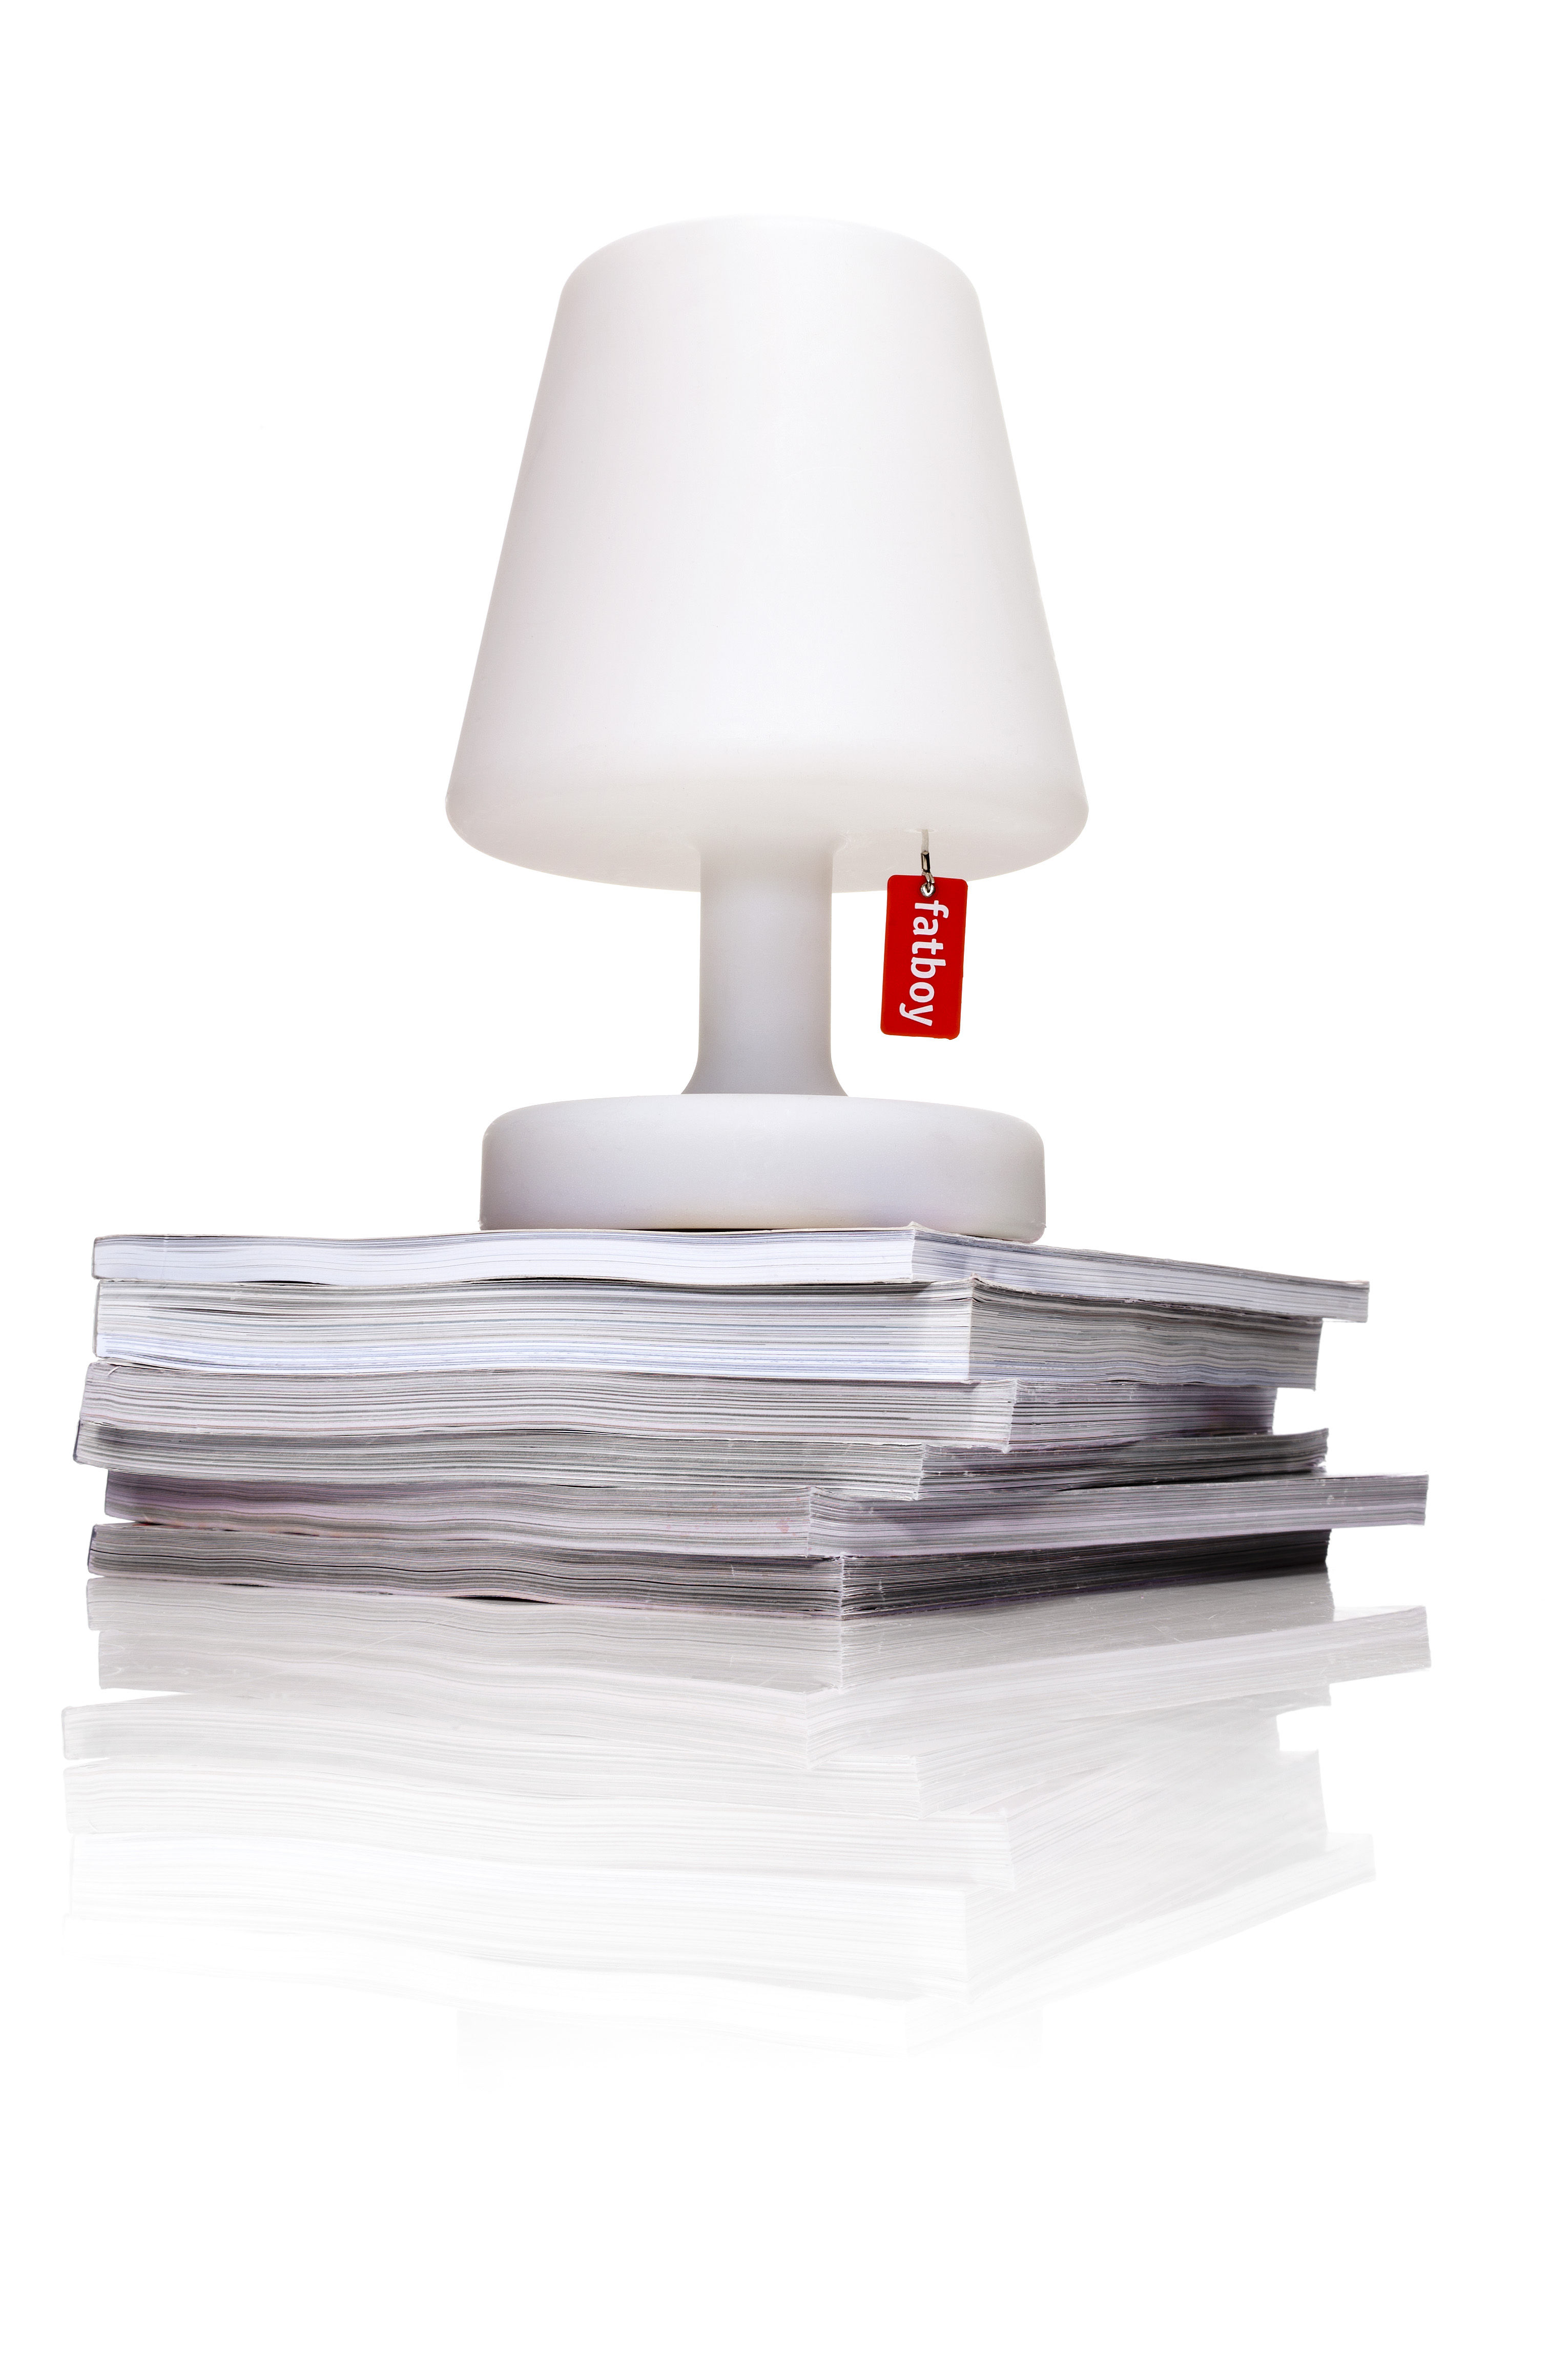 edison the petit ii lampe ohne kabel h 25 cm led akkubetrieben auch via usb aufladbar. Black Bedroom Furniture Sets. Home Design Ideas